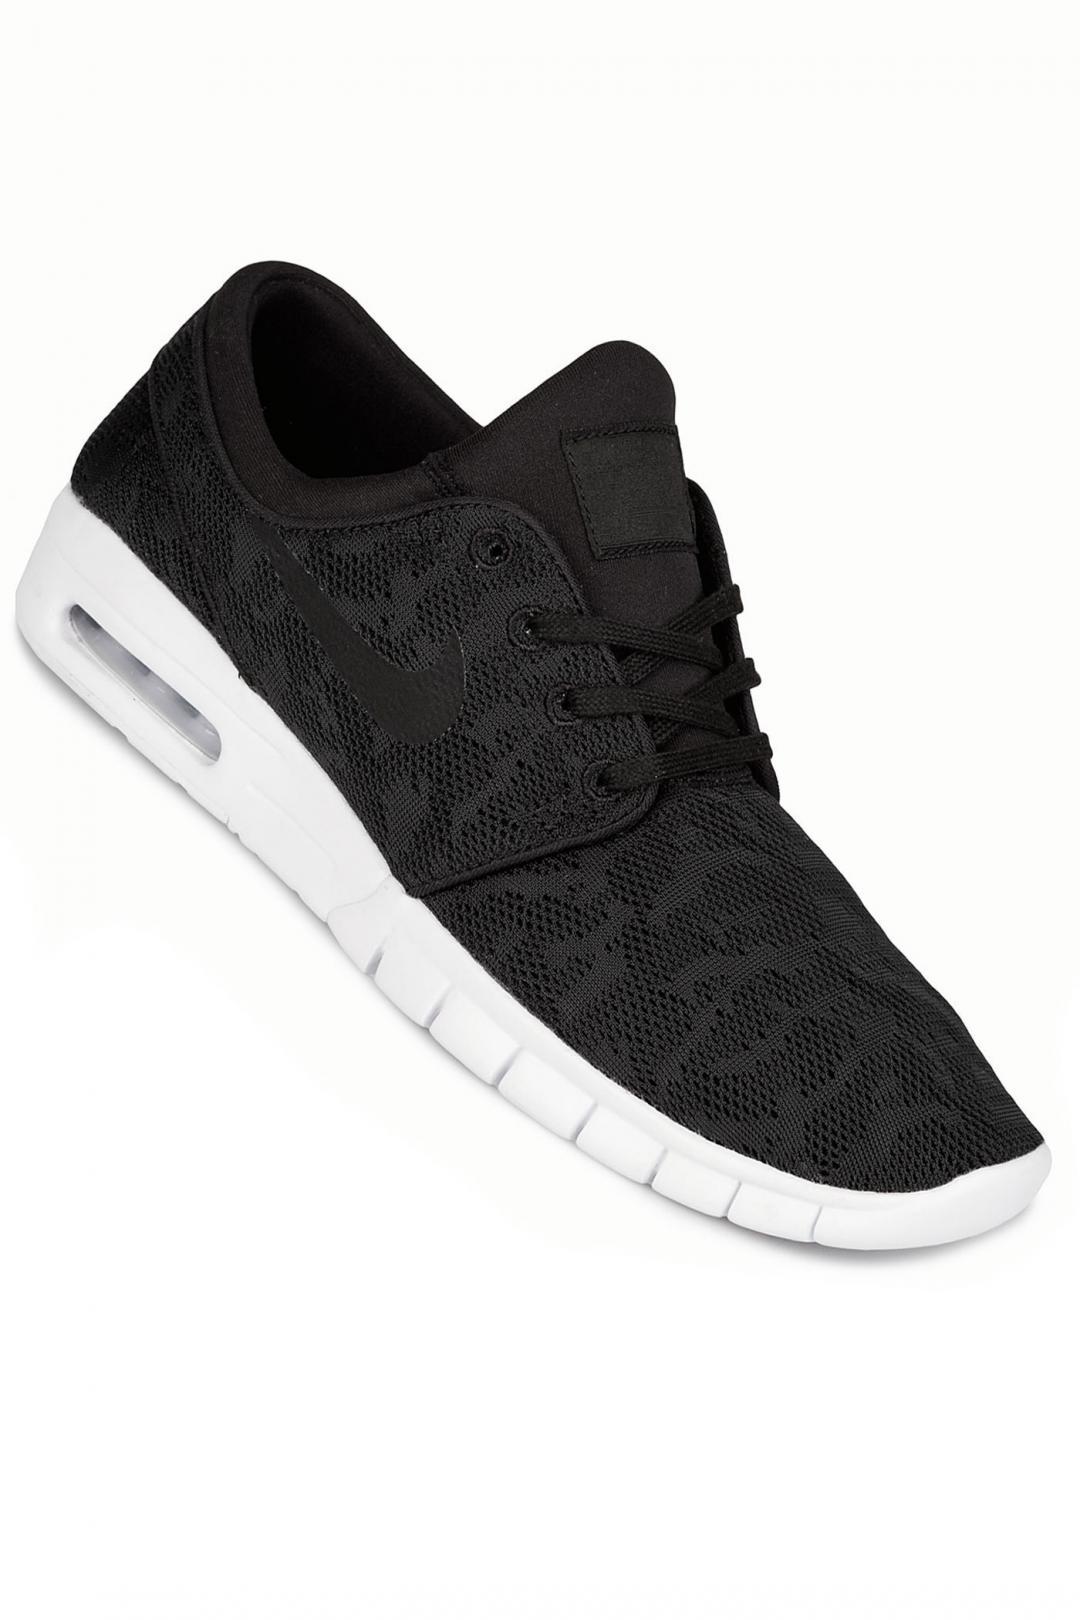 Uomo/Donna Nike SB Stefan Janoski Max black black white | Sneakers low top